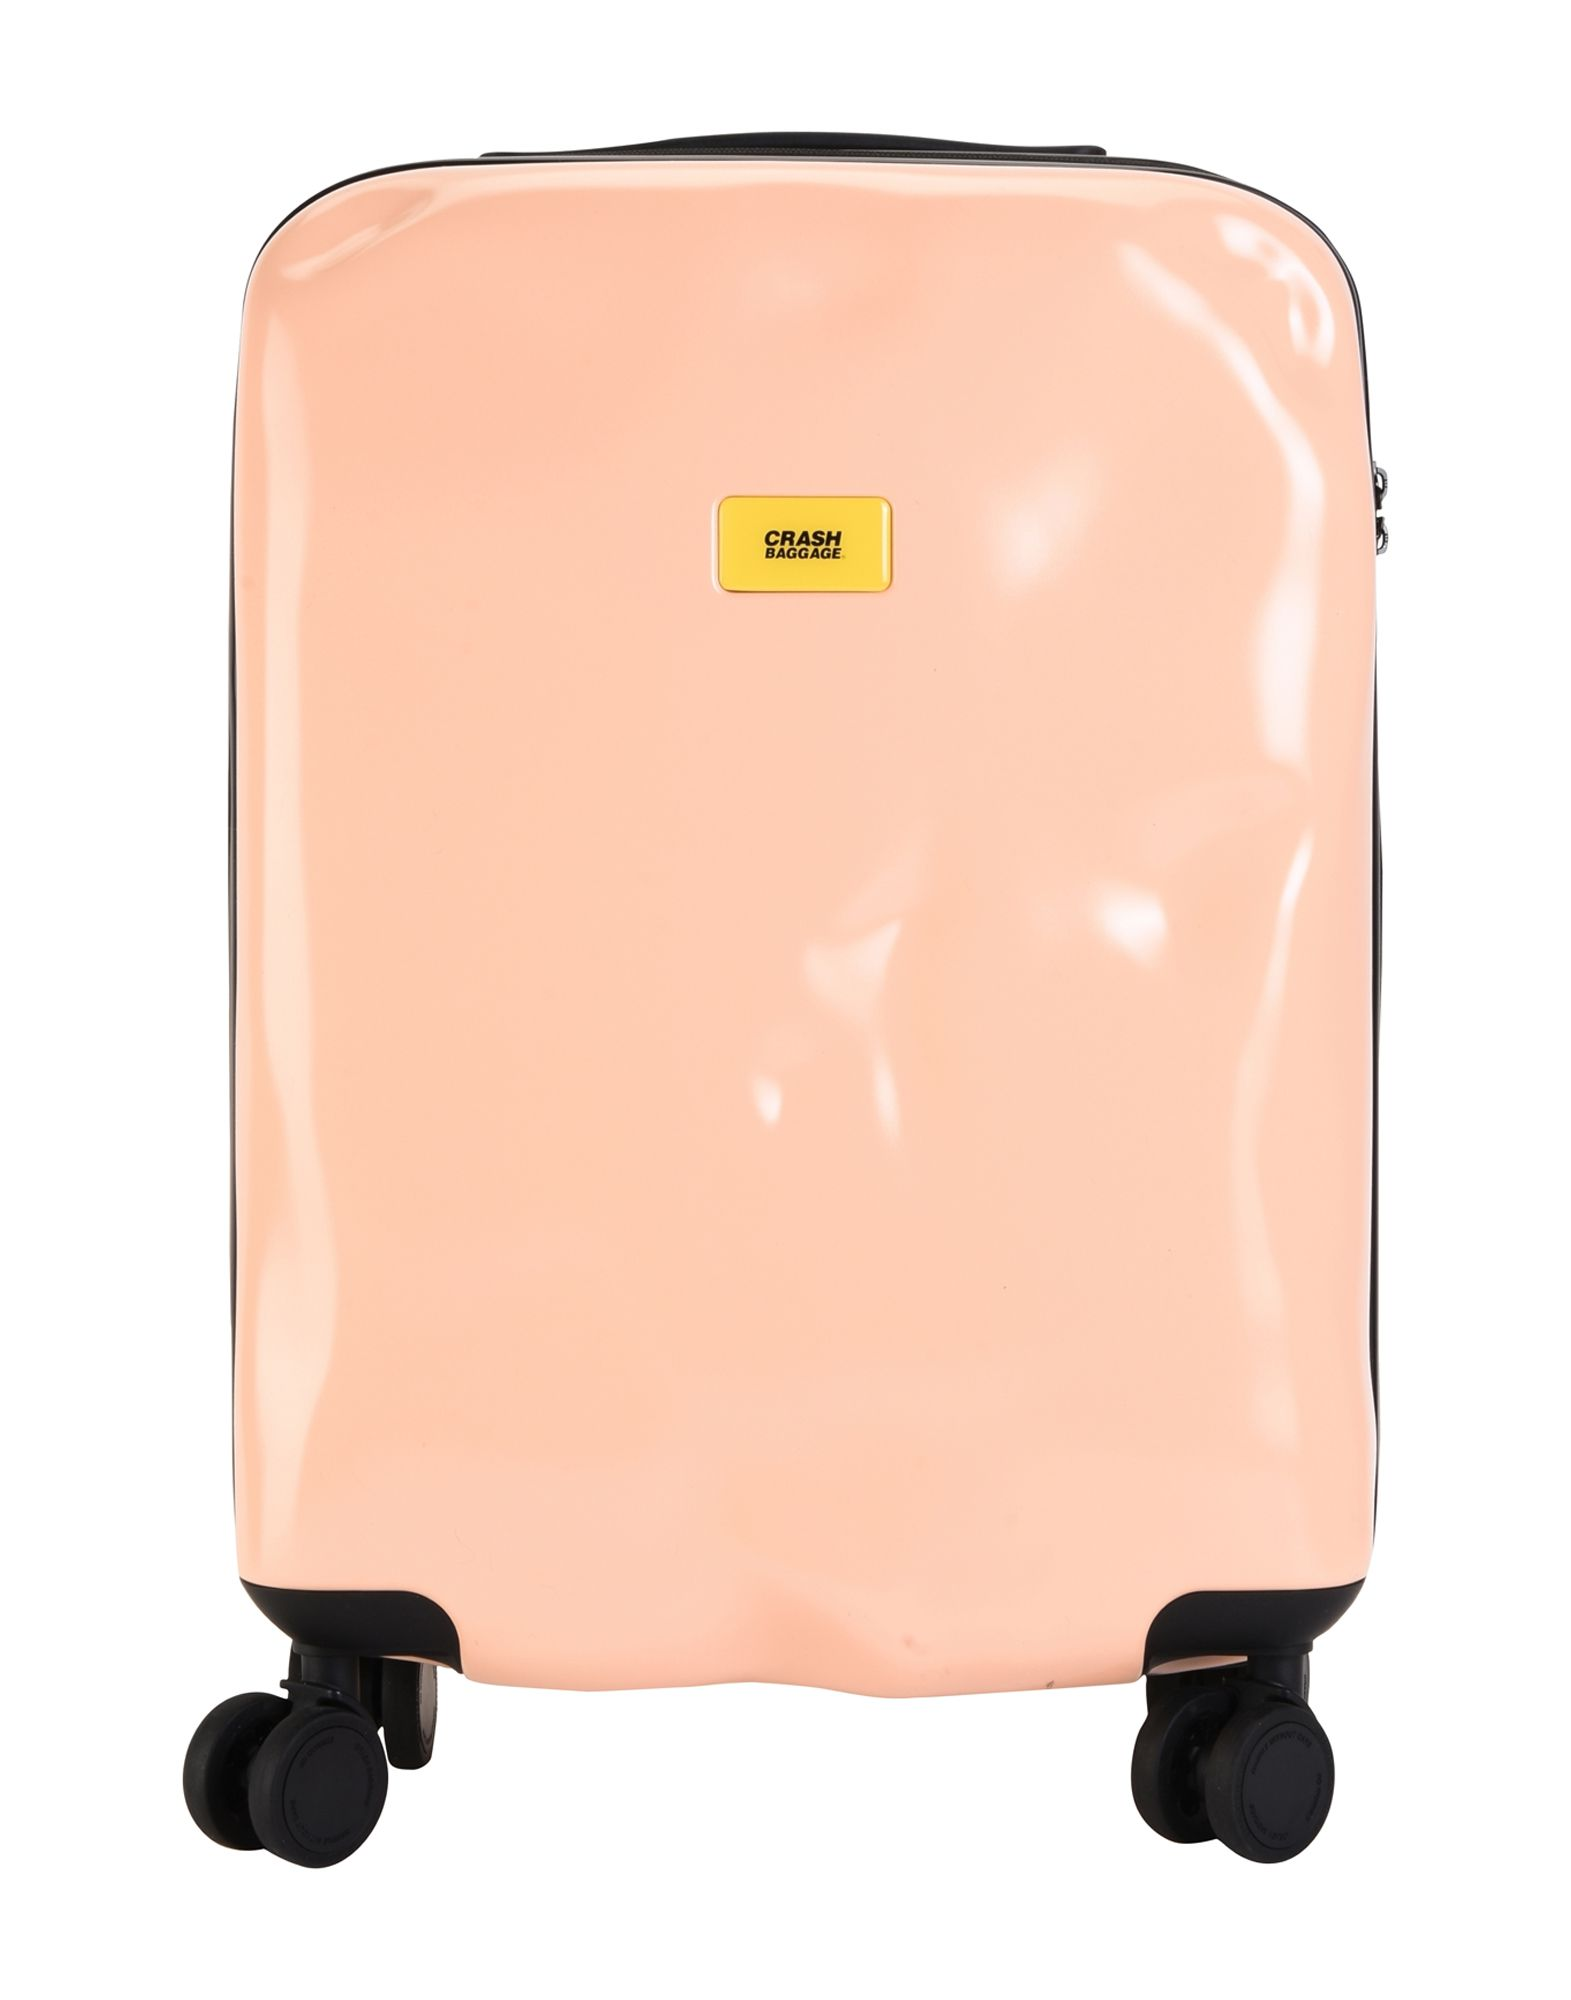 CRASH BAGGAGE Wheeled Luggage in Salmon Pink